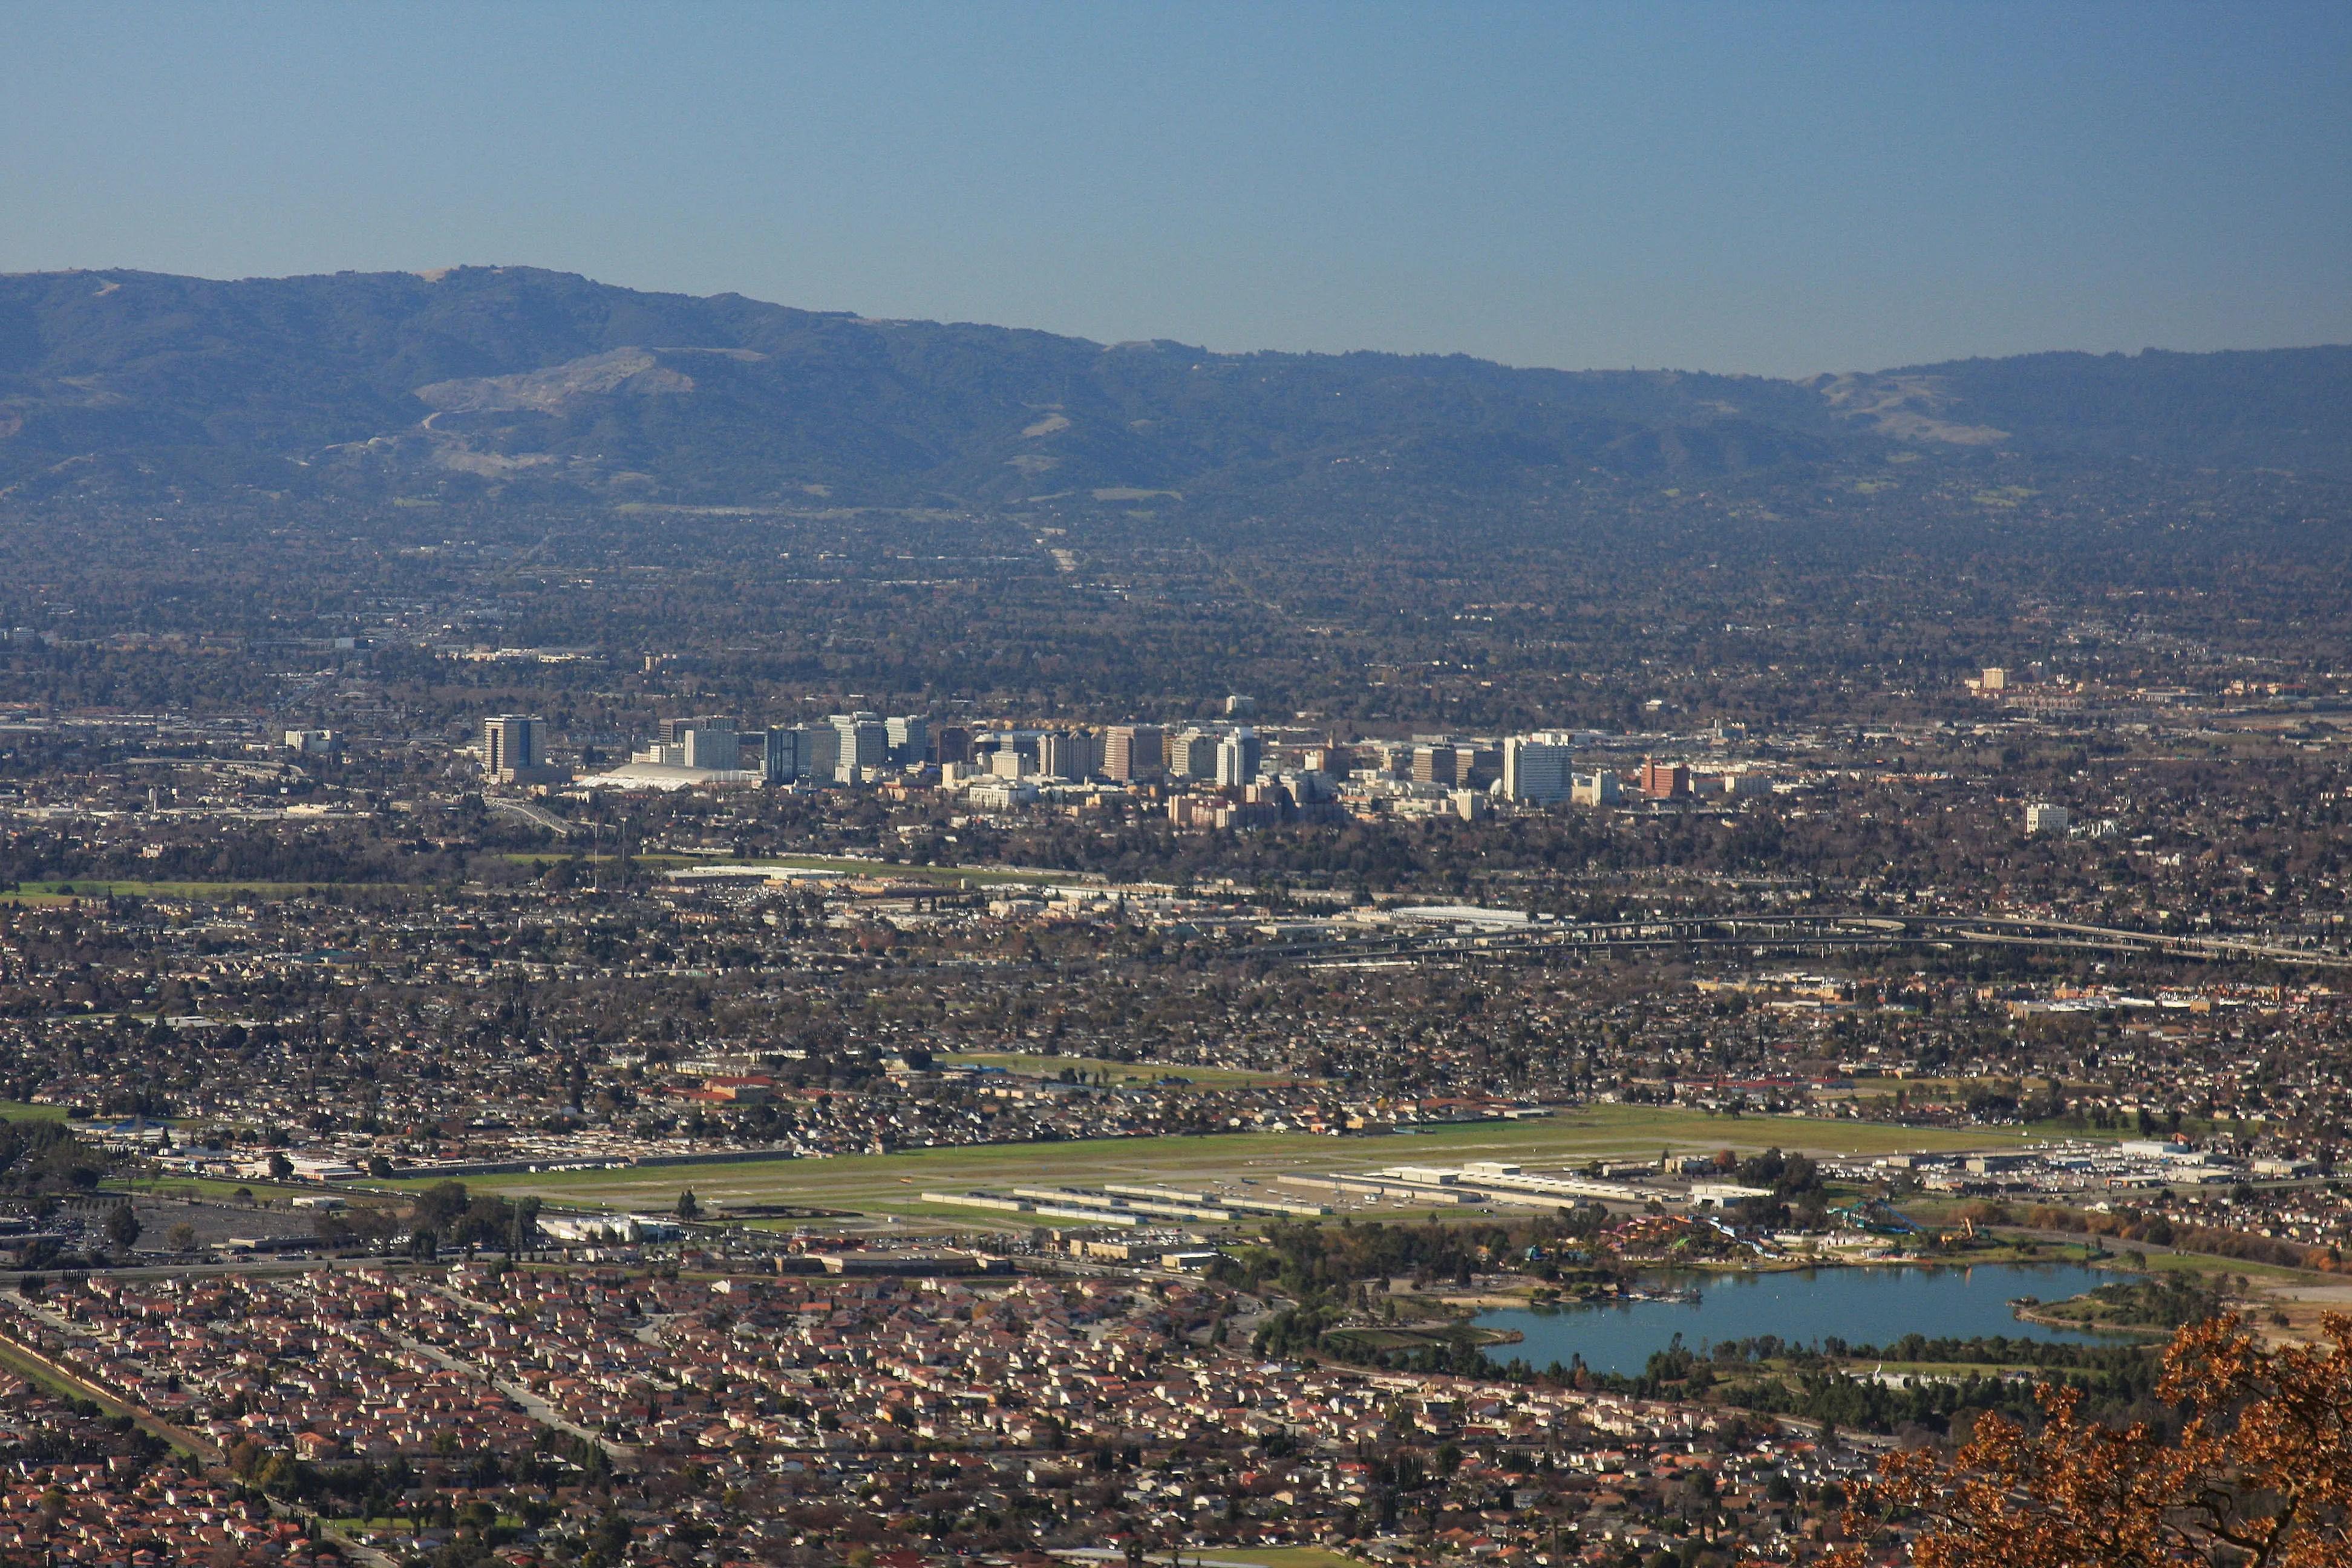 15 (tie). San Jose, California: 47.01 hours